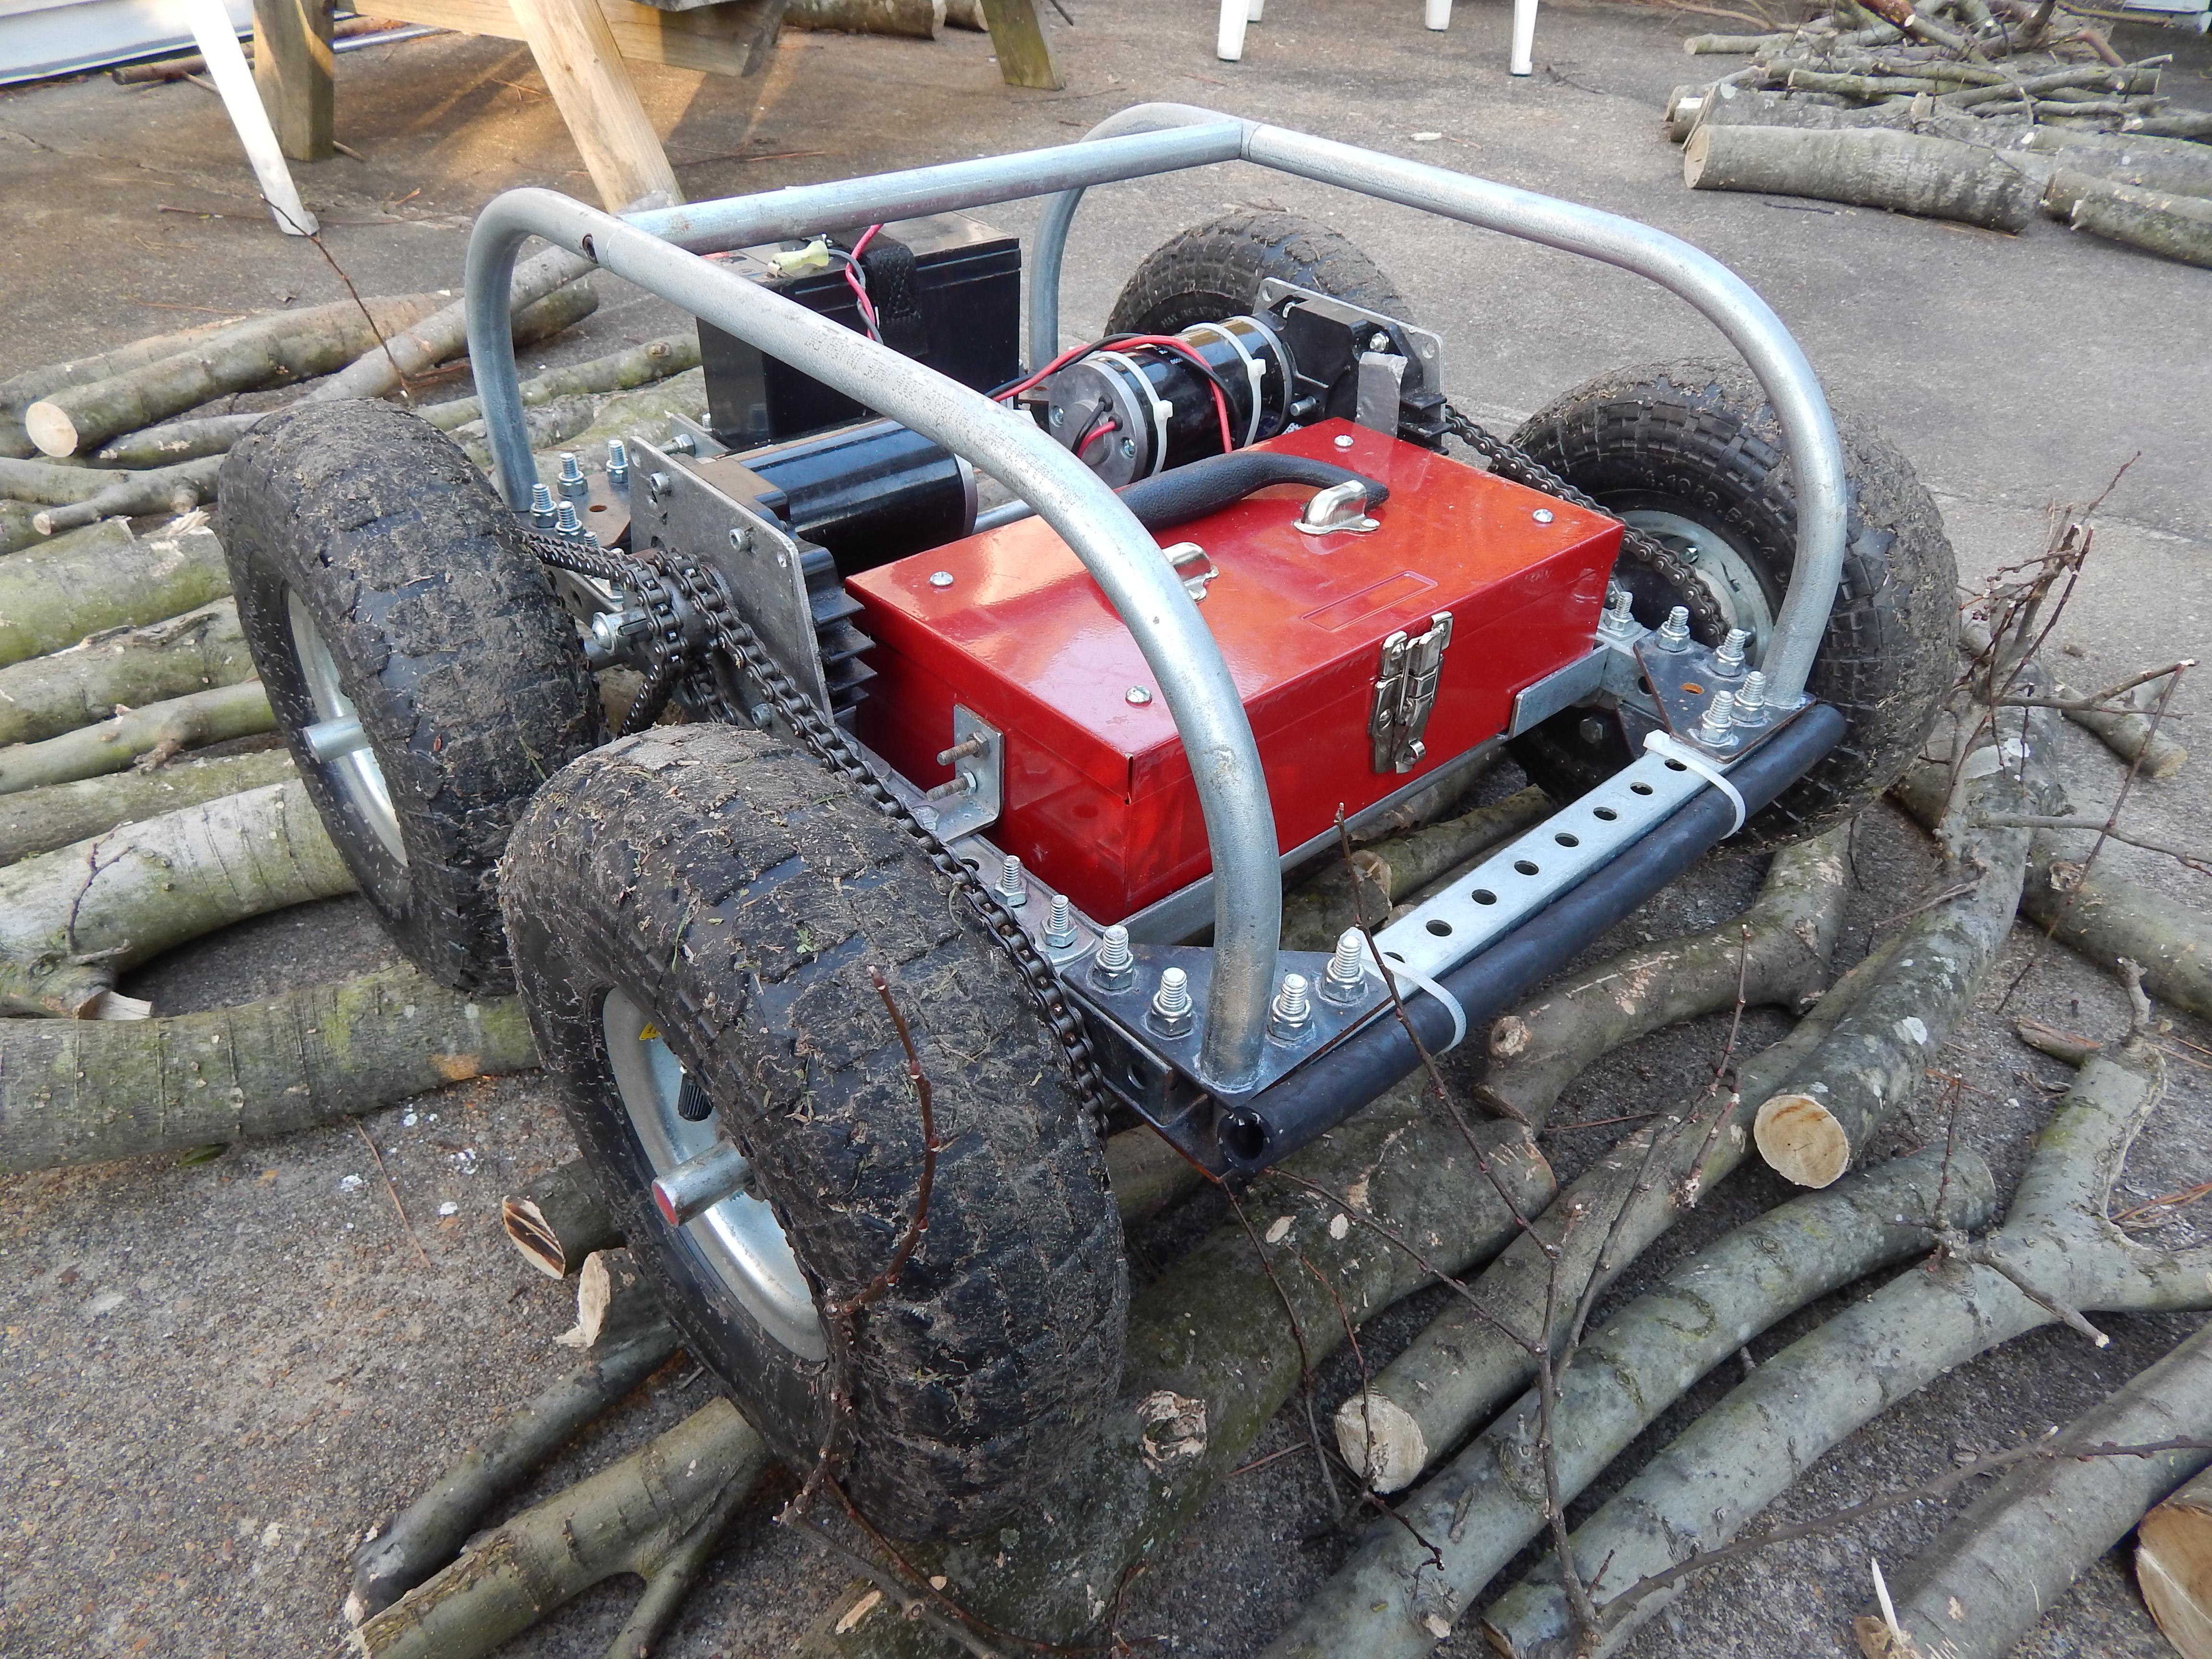 Enginursday The Hormes Robot Platform News Sparkfun Electronics Project How To Make A Remote Control Car